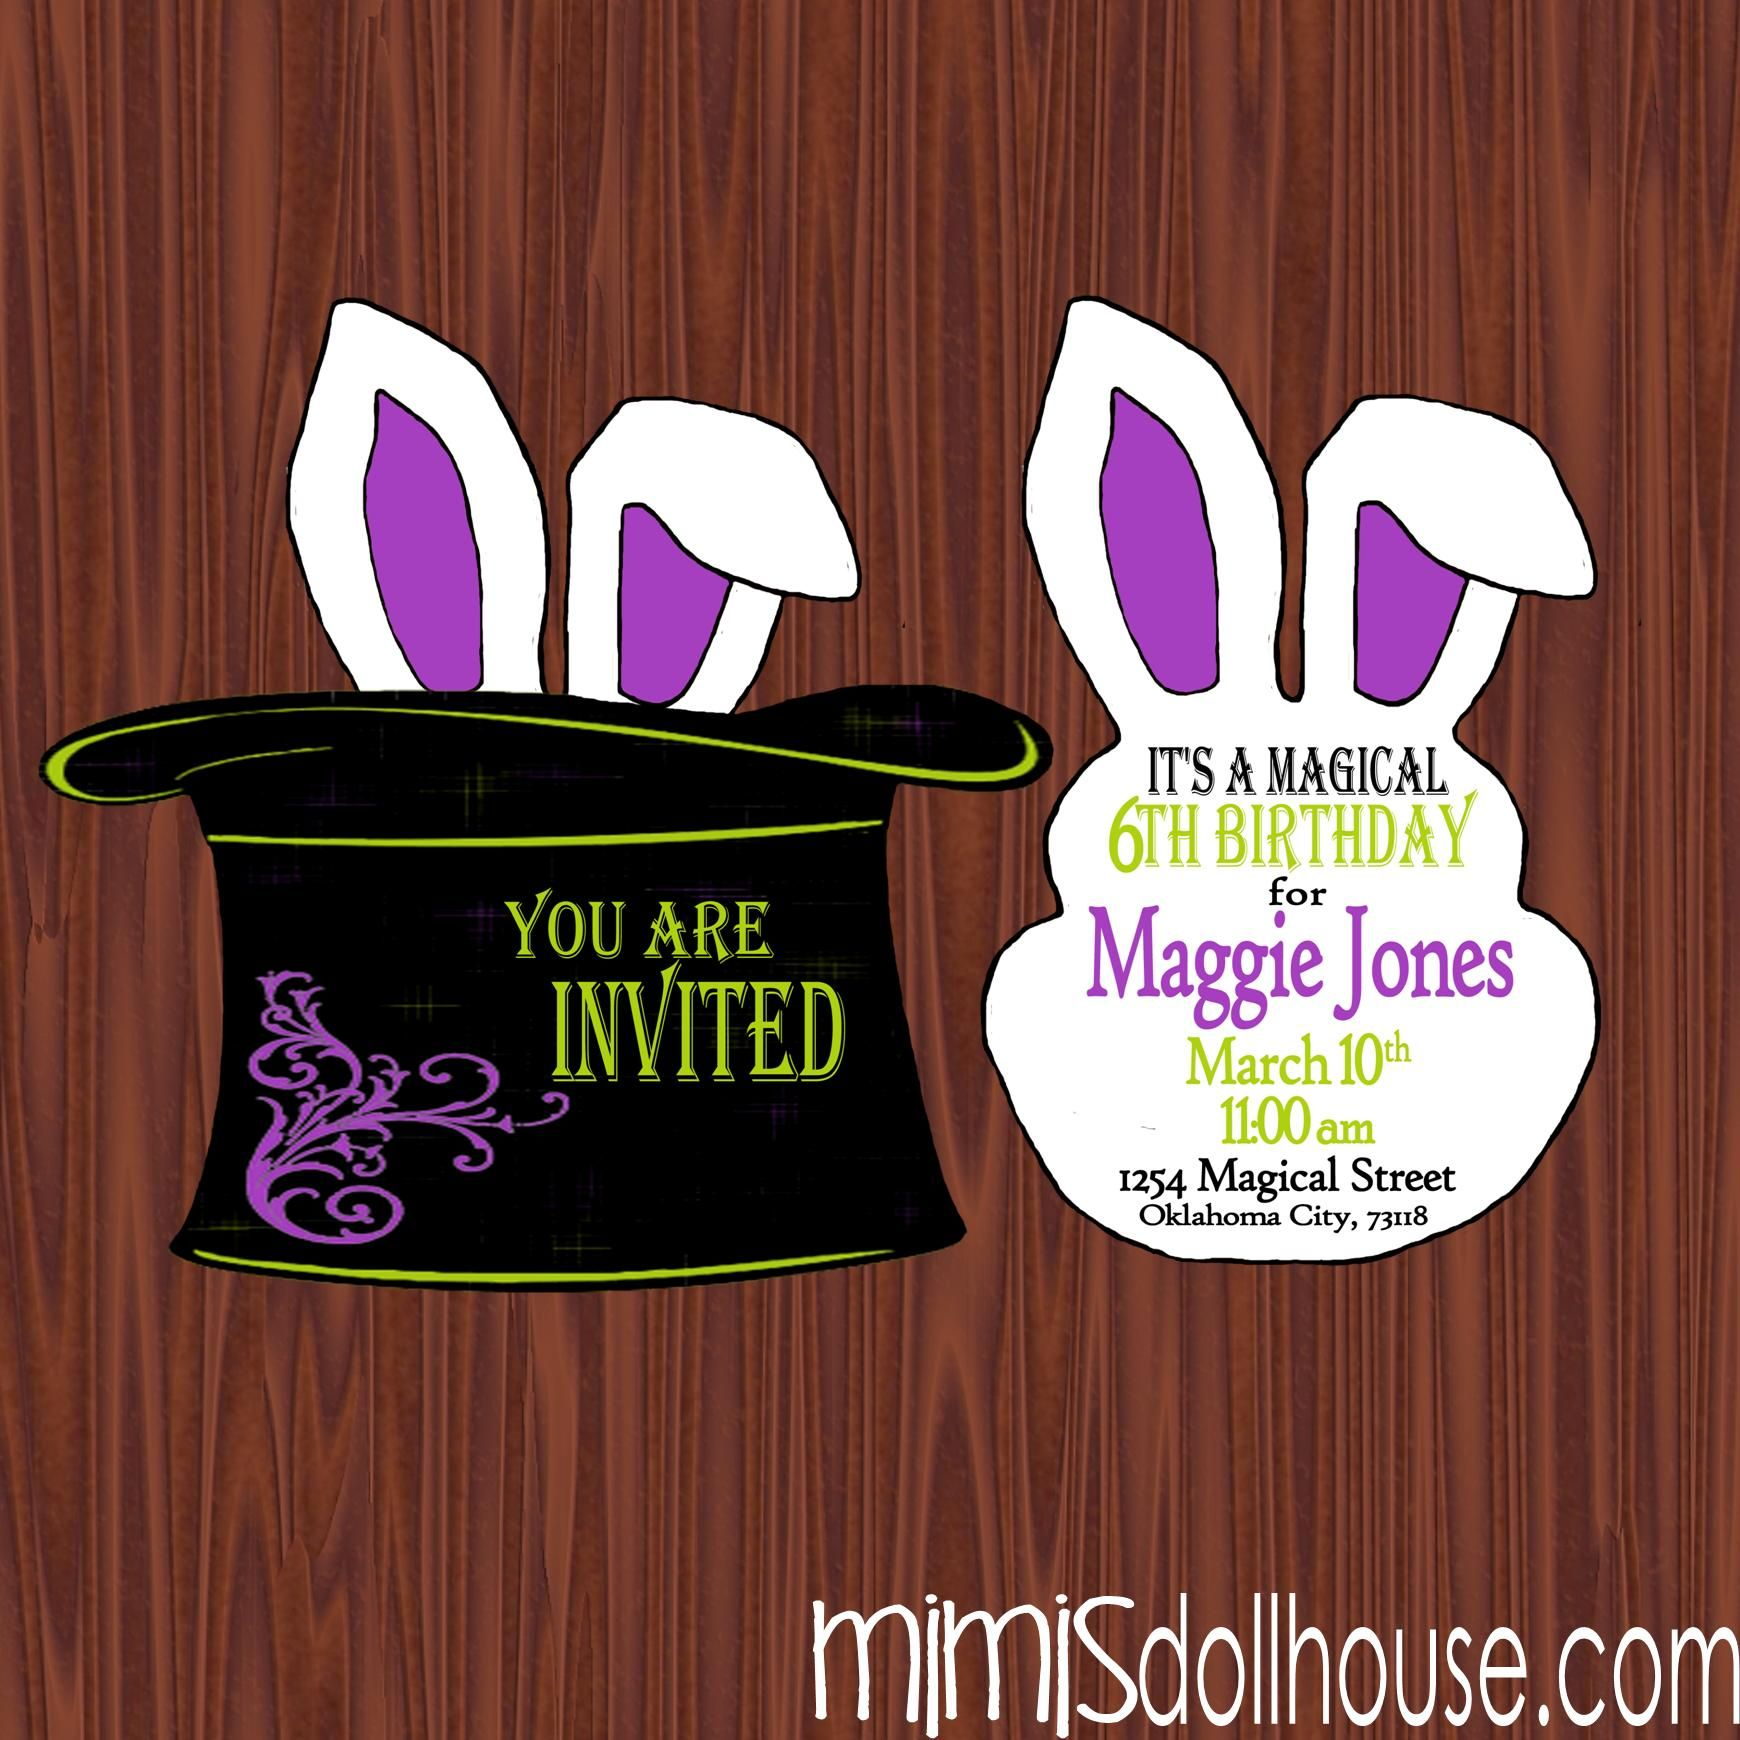 magic party - Cerca con Google | bunny party | Pinterest | Magic ...